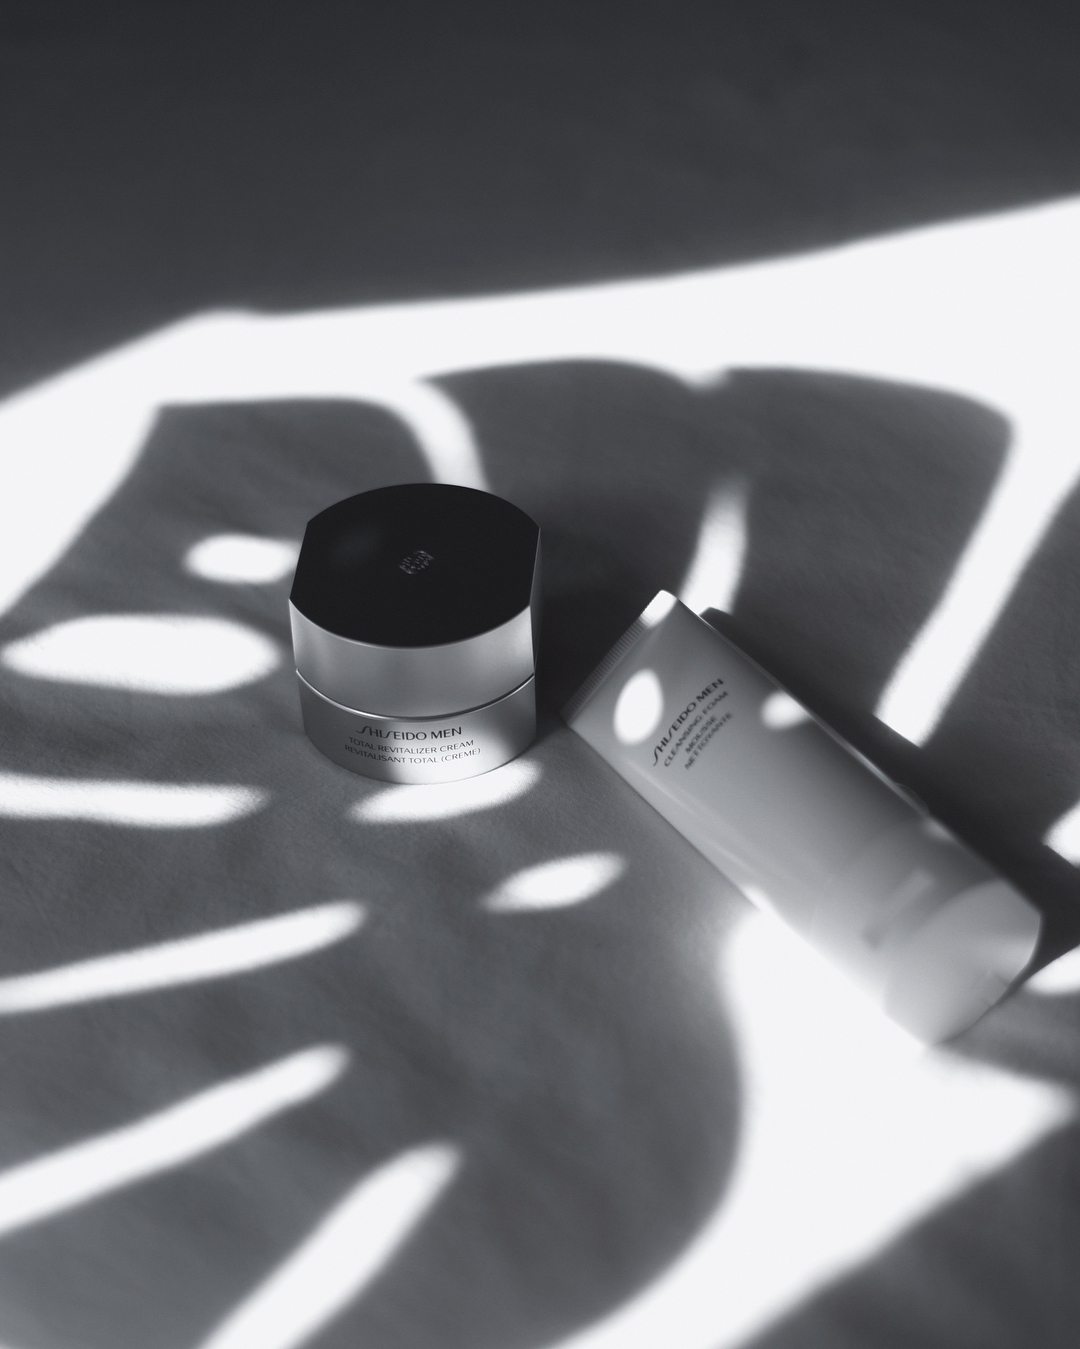 Shiseido Men Products - Manuel Otgianu - ULMN